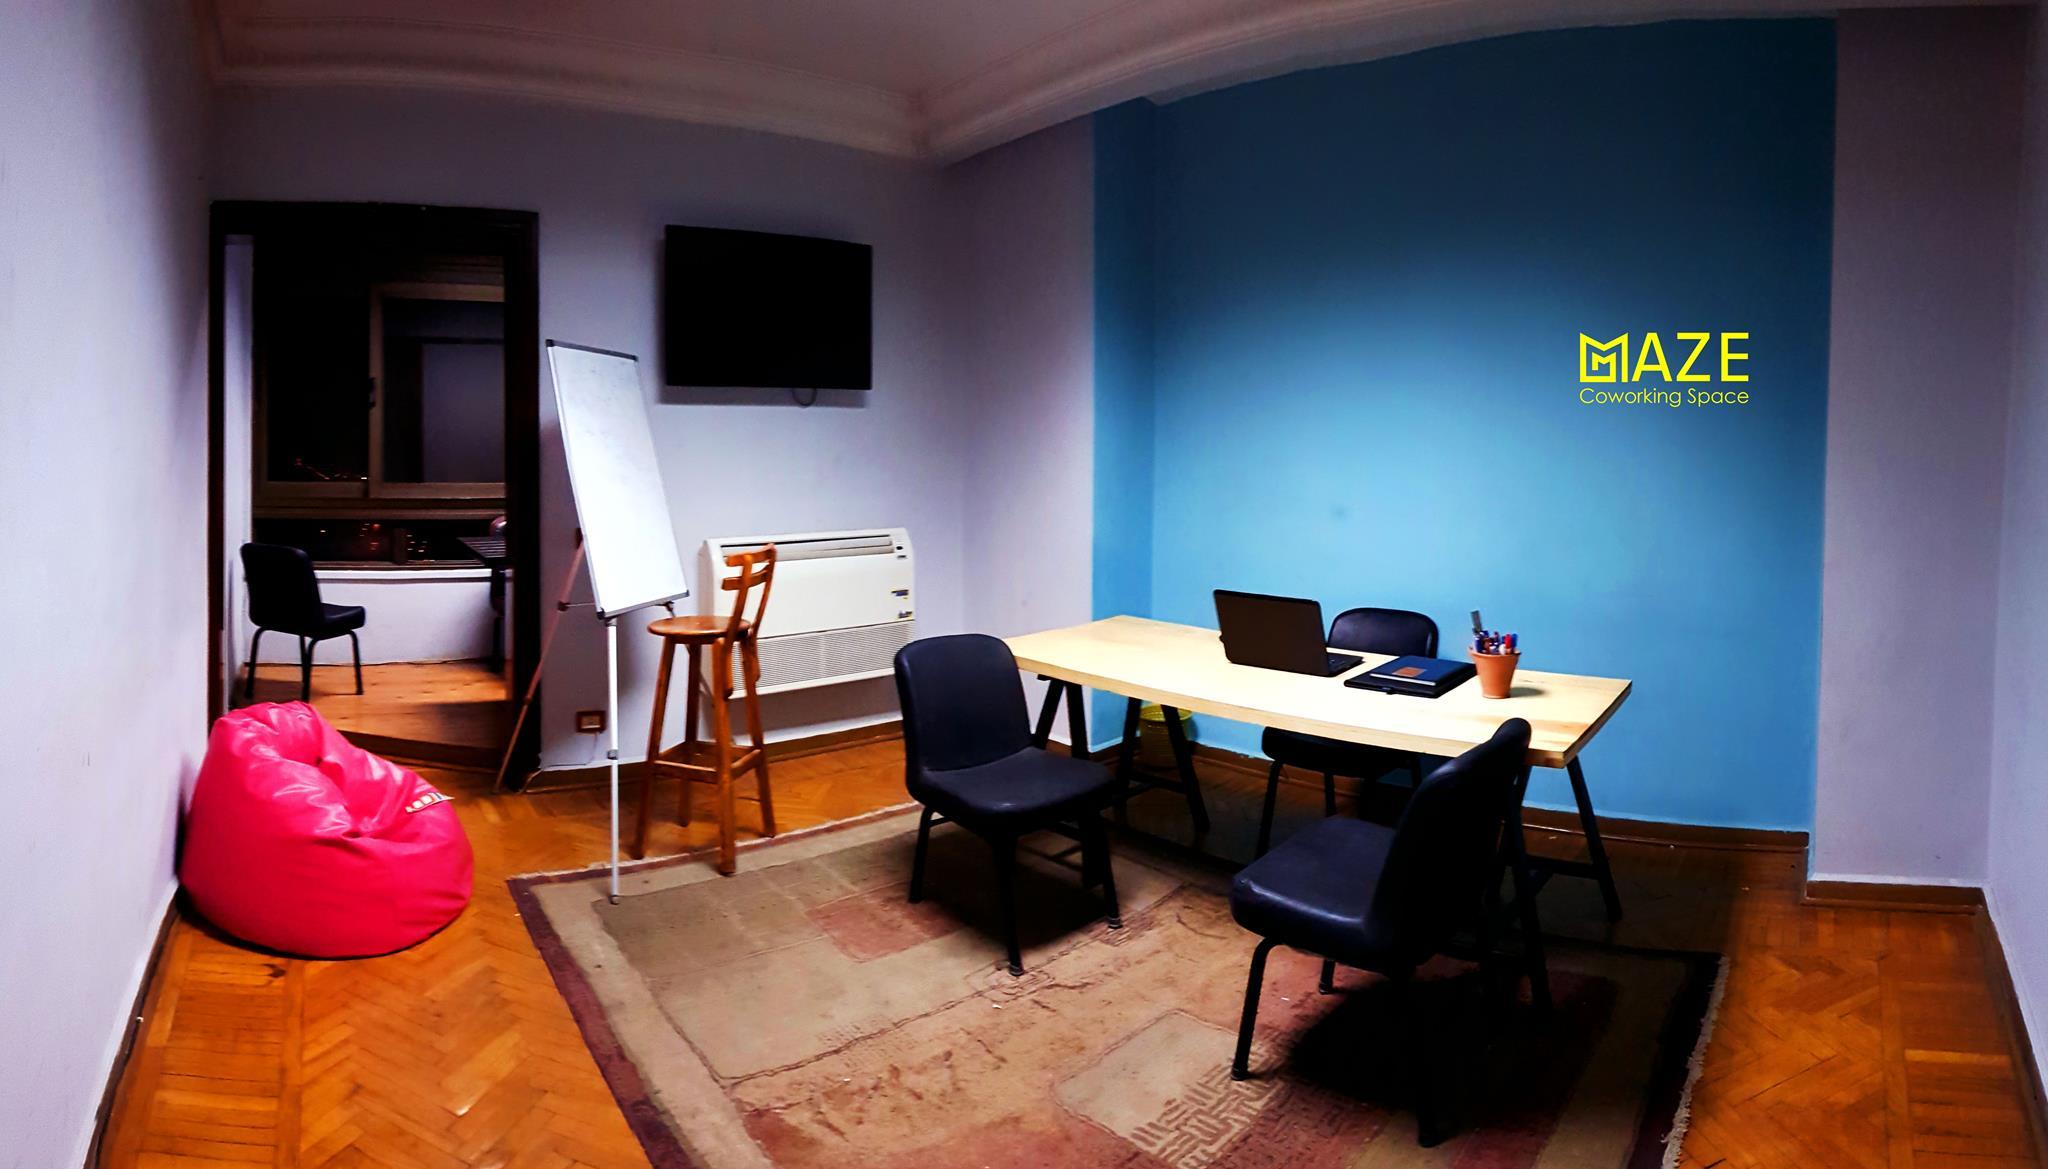 Maze Coworking Space, Giza